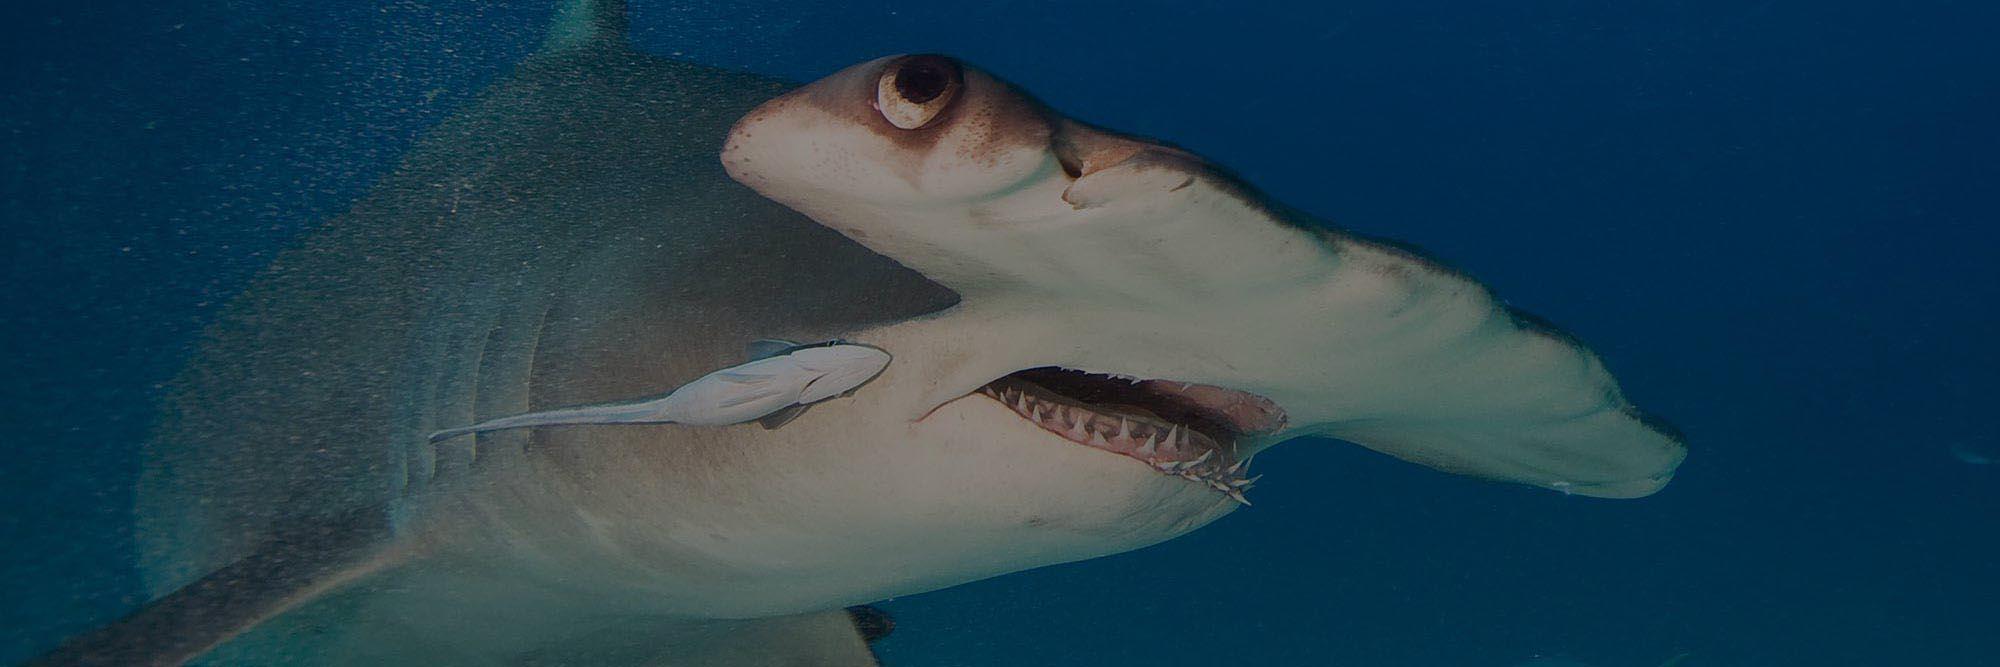 banner-Hammerhead-shark-3-1-dark